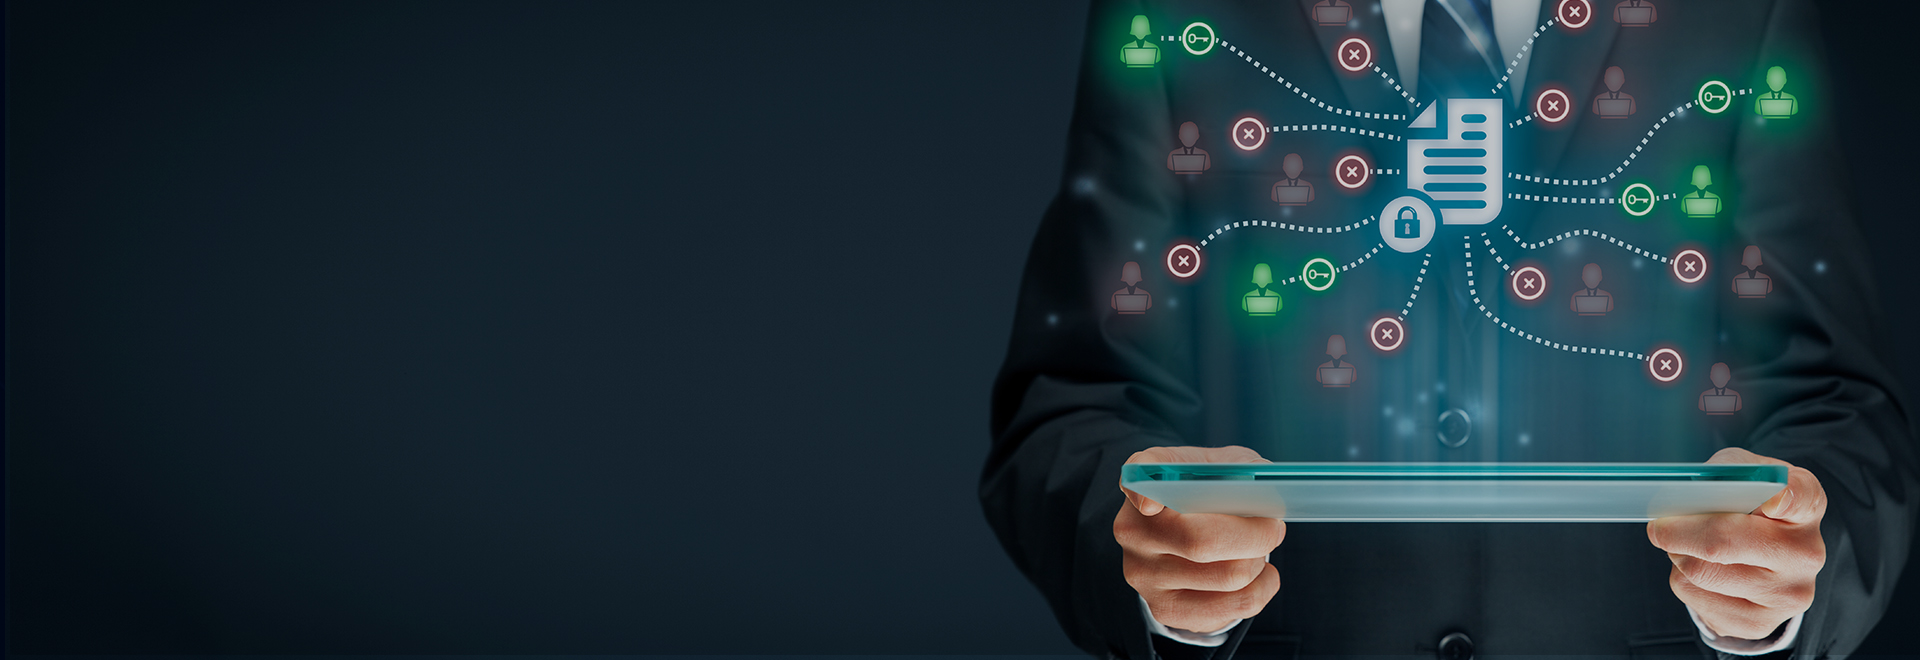 Petrofac in Mexico chooses AuditBOT Process Controls